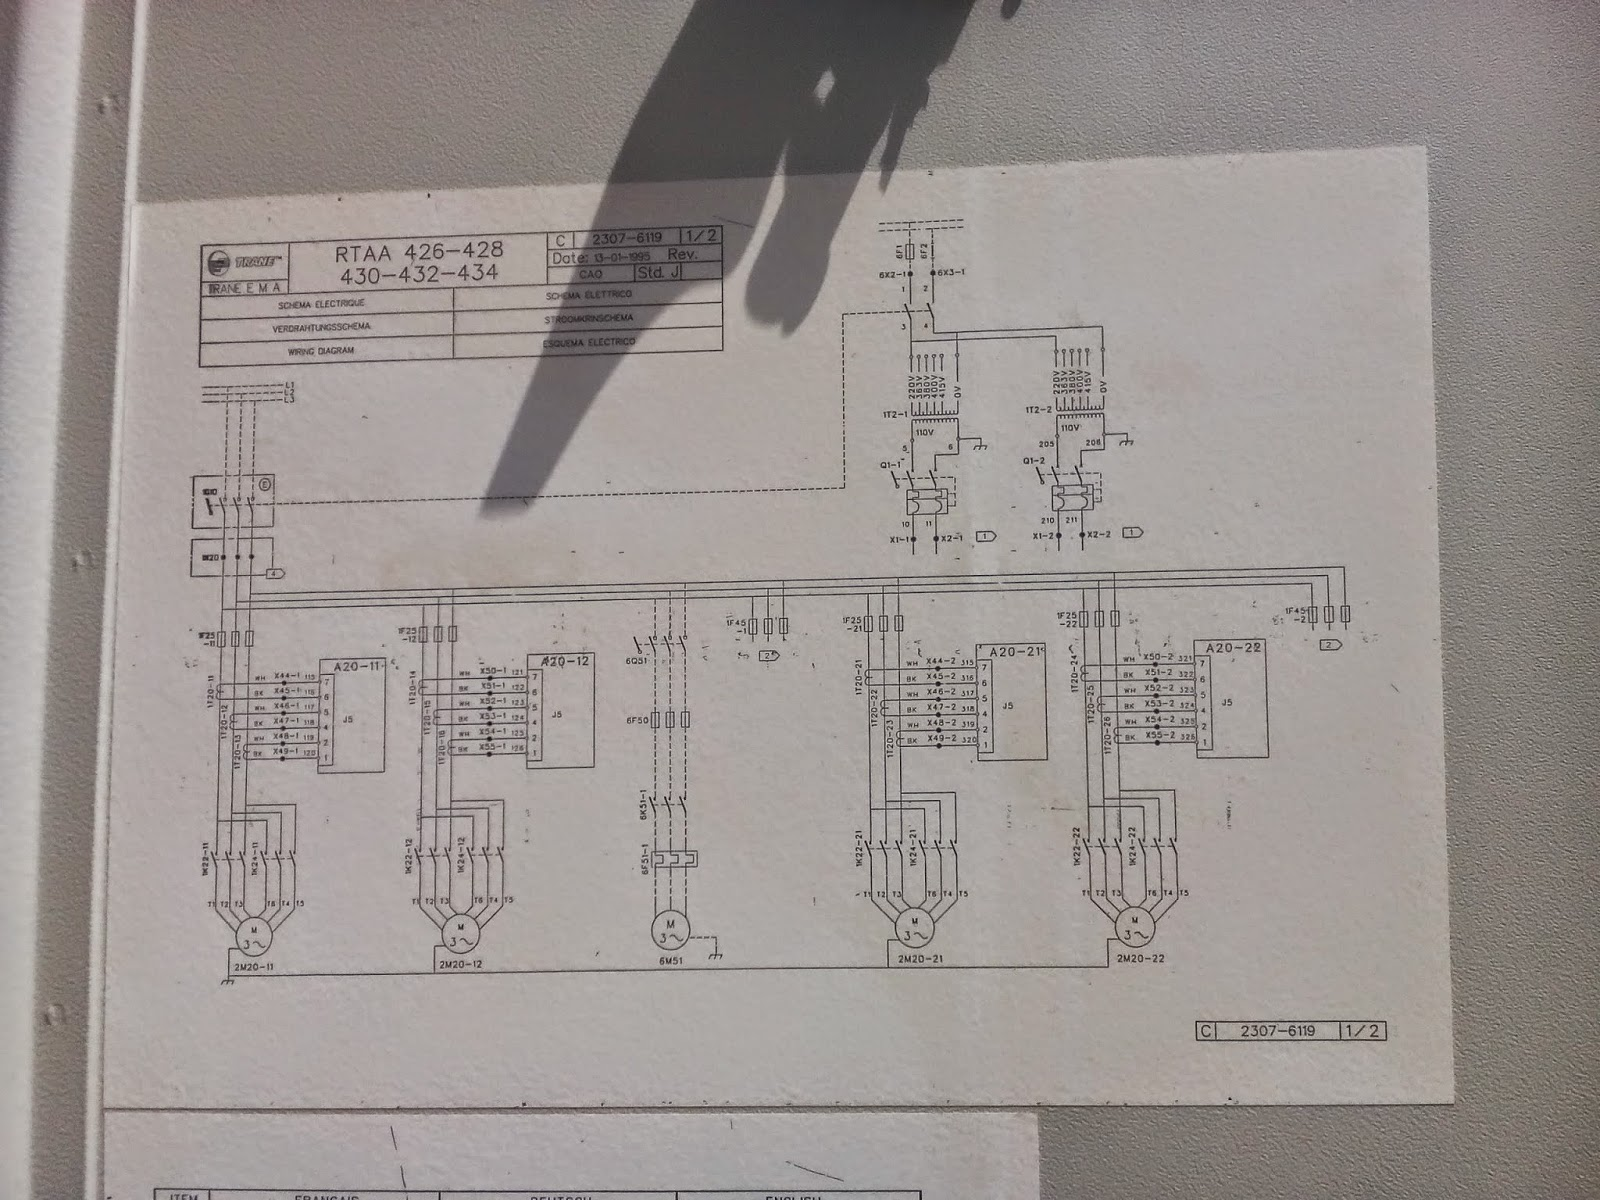 Trane Wiring Diagrams Model Echalon Schematic Heat Pump Diagram Residential Electrical Symbols U2022